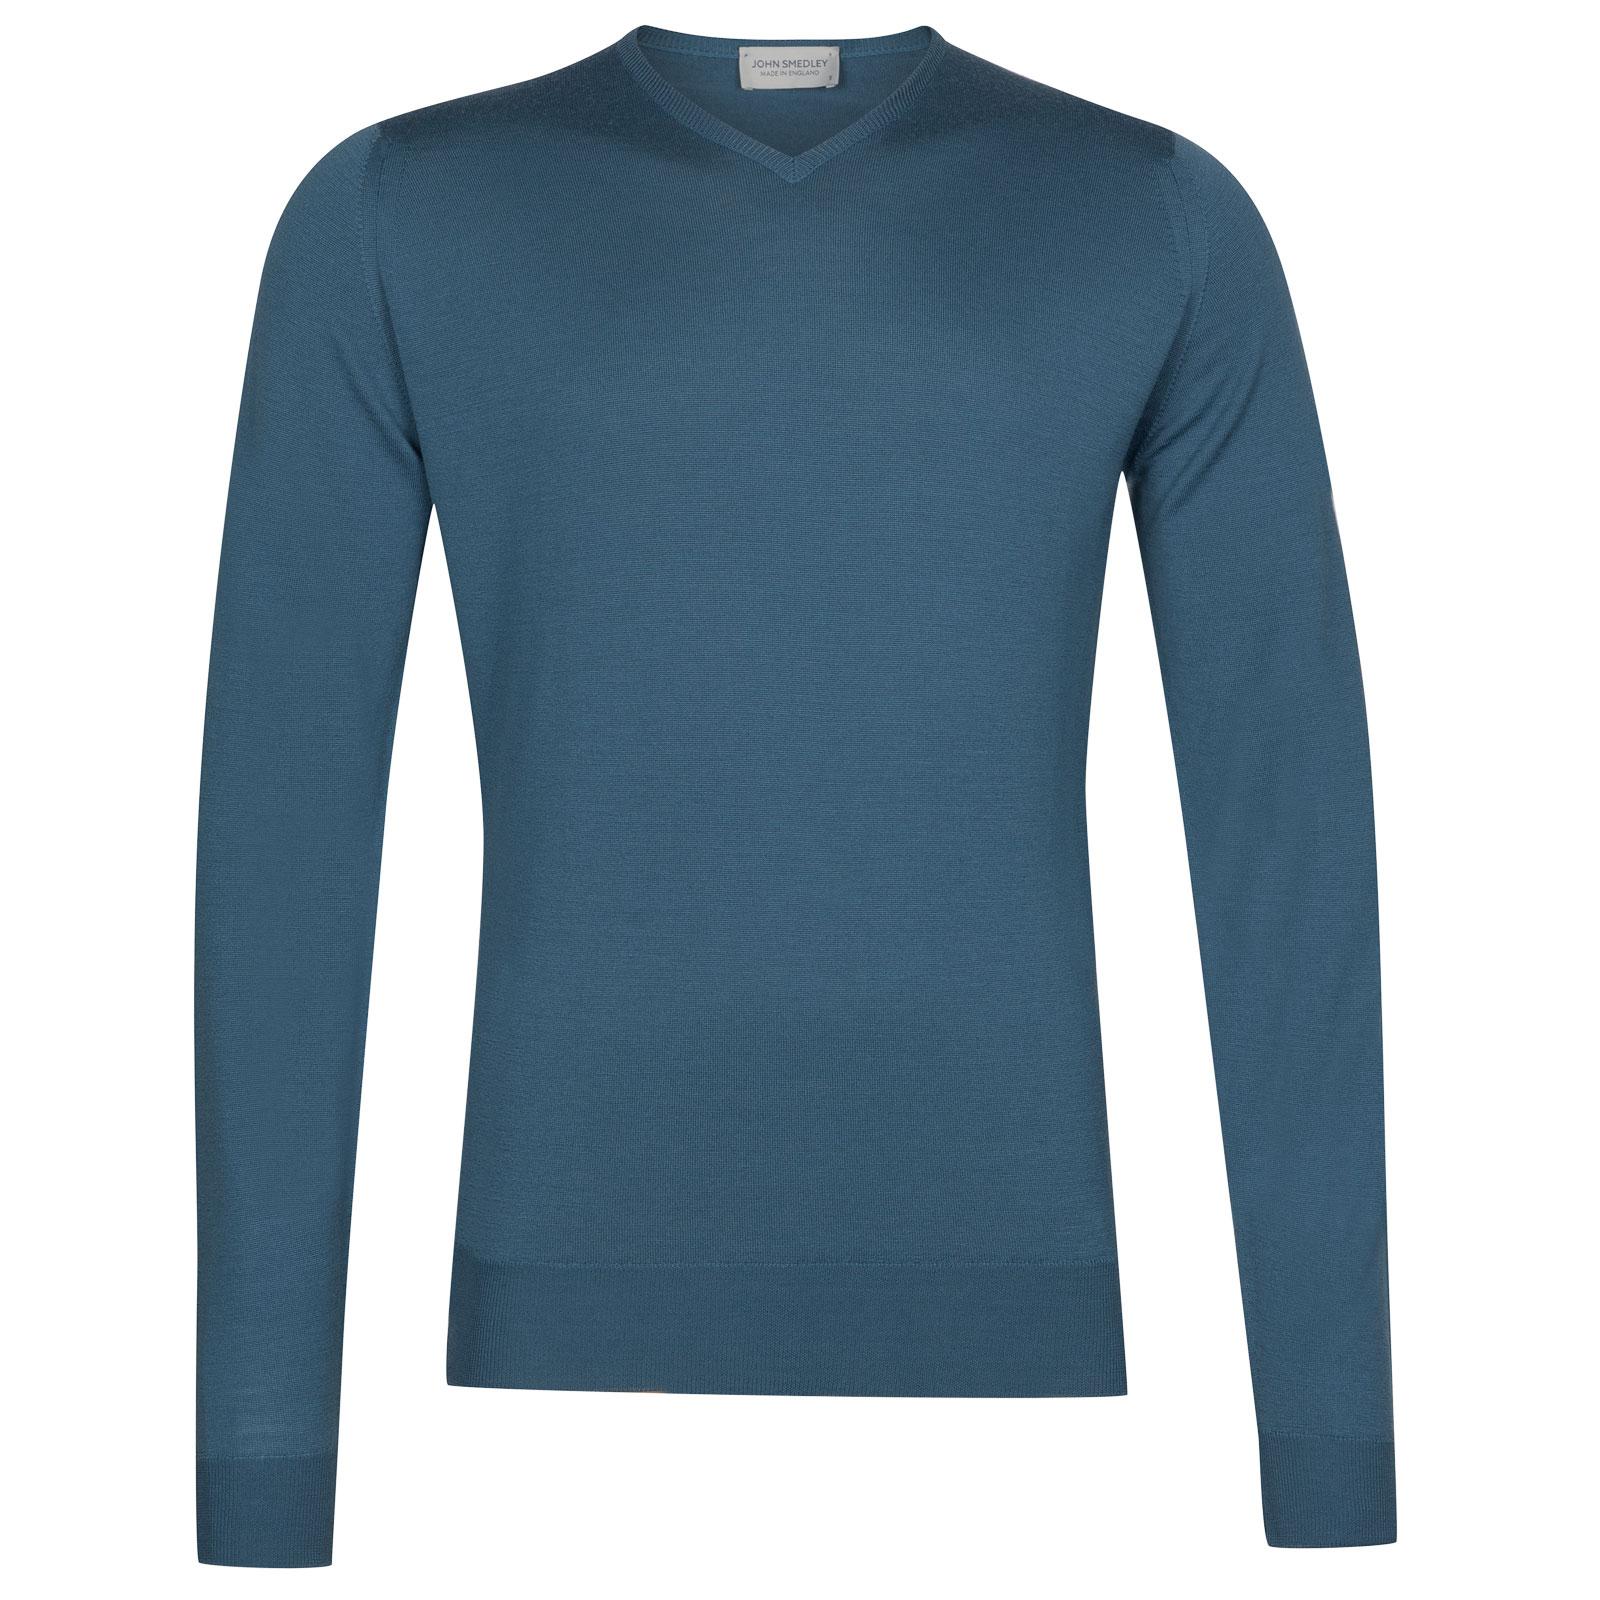 John Smedley Shipton Merino Wool Pullover in Bias Blue-L